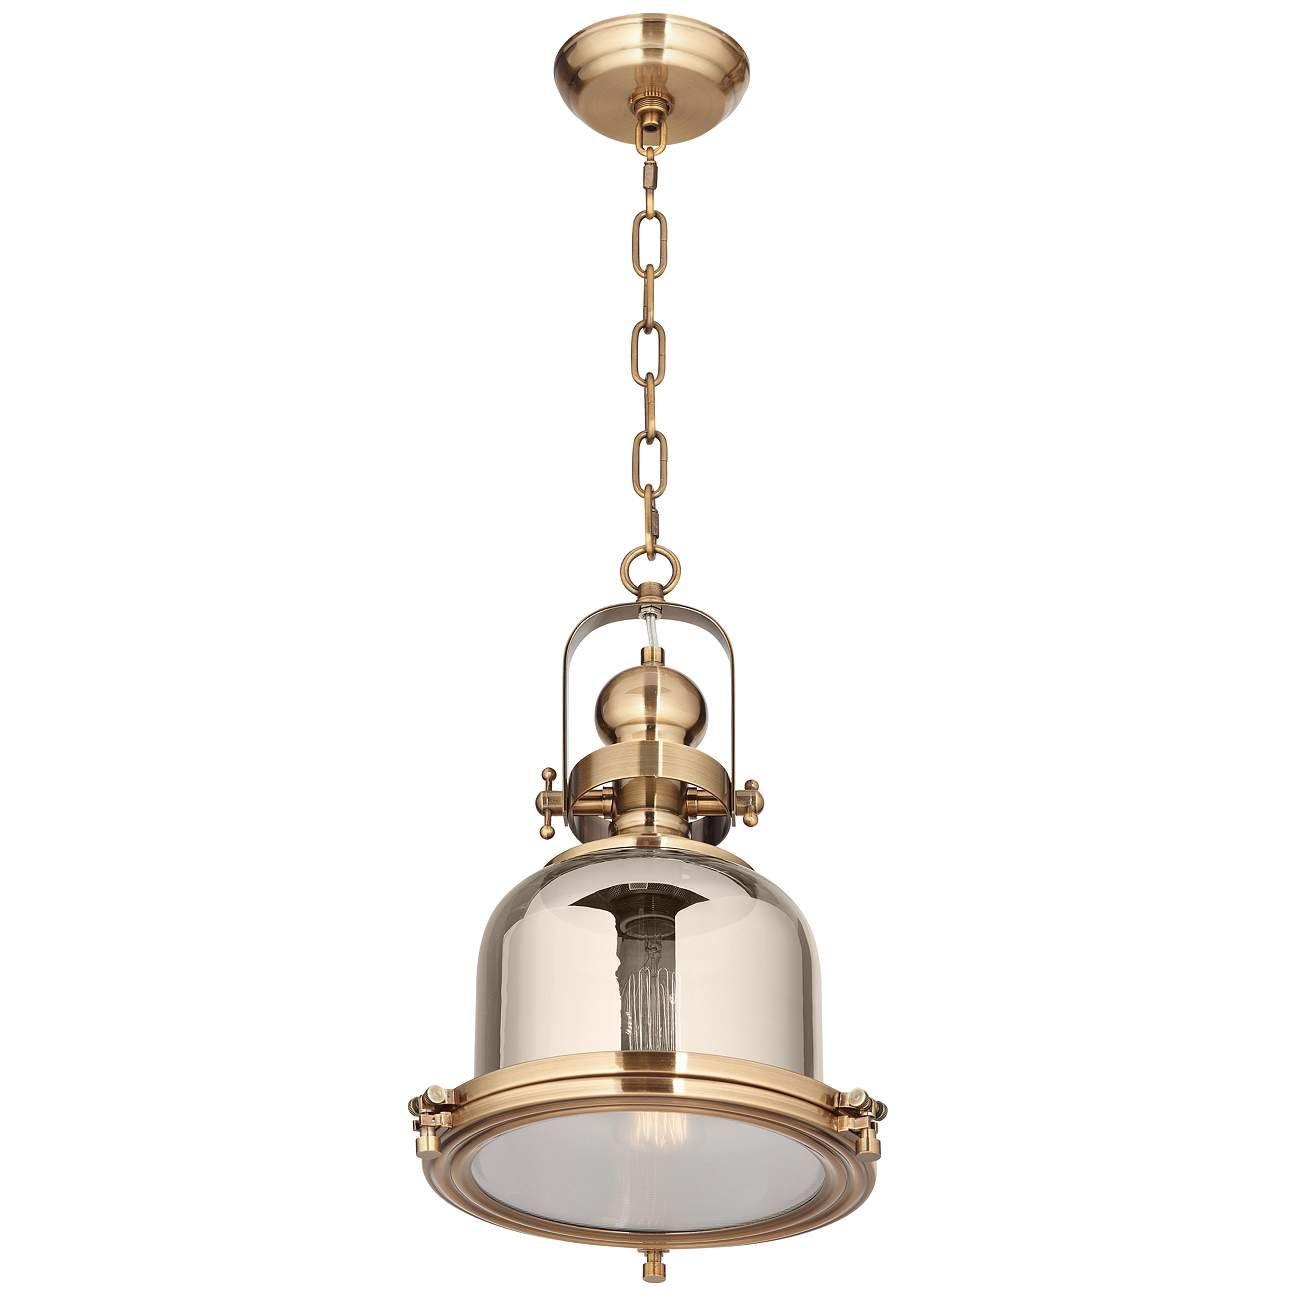 Elida Antique Brass 11 Wide Chrome Glass Mini Pendant Light 1f211 Lamps Plus In 2021 Mini Pendant Lights Pendant Light Brass Lantern Pendant Brass mini pendant light